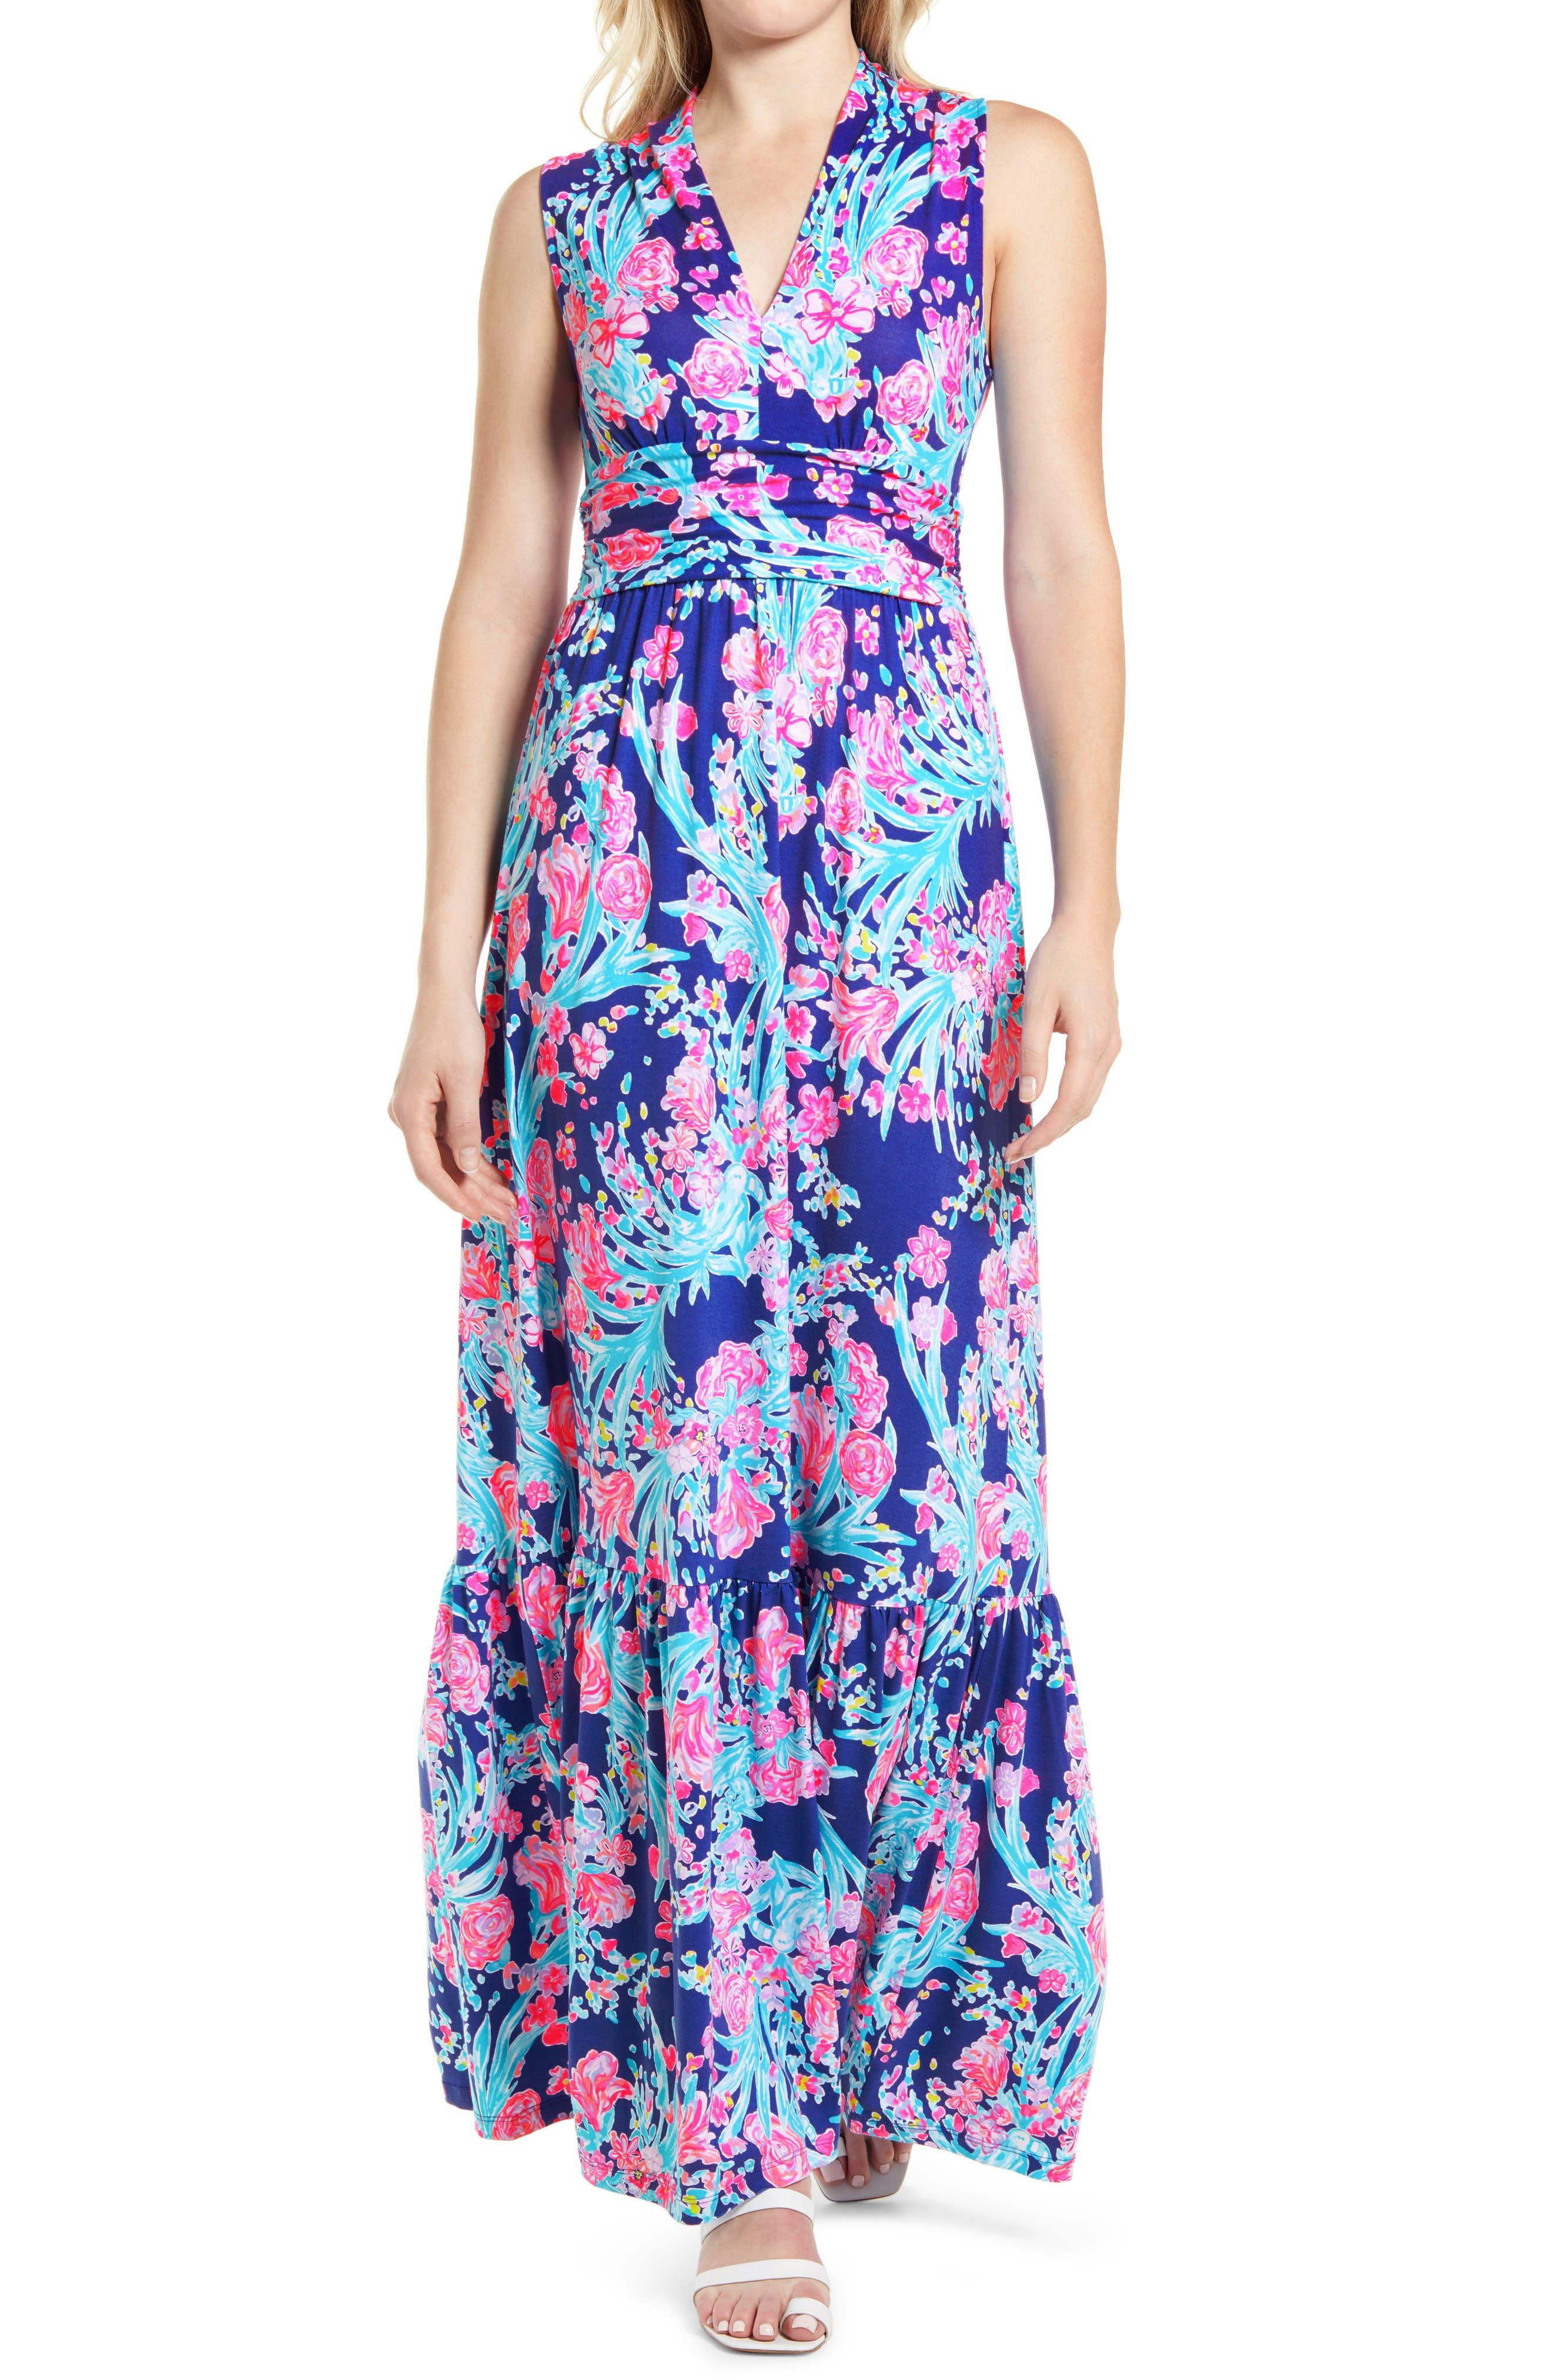 Women's Lilly Pulitzer Pearce Sleeveless Midi Dress